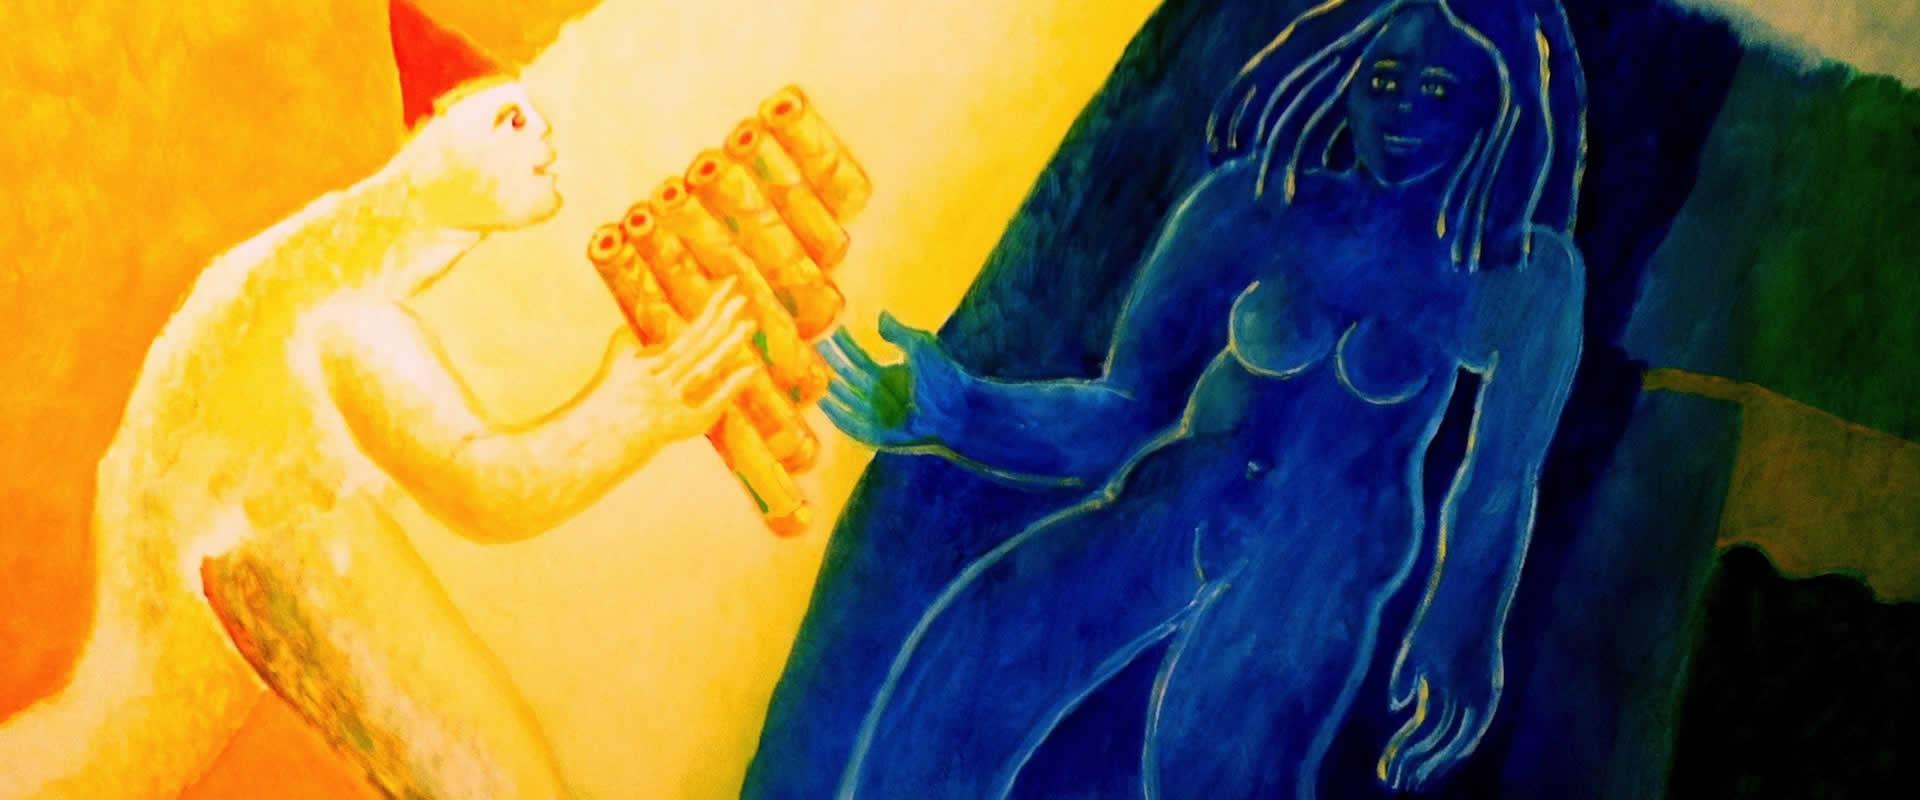 Dipinti in Stile Arte Figurativa - Calabrò